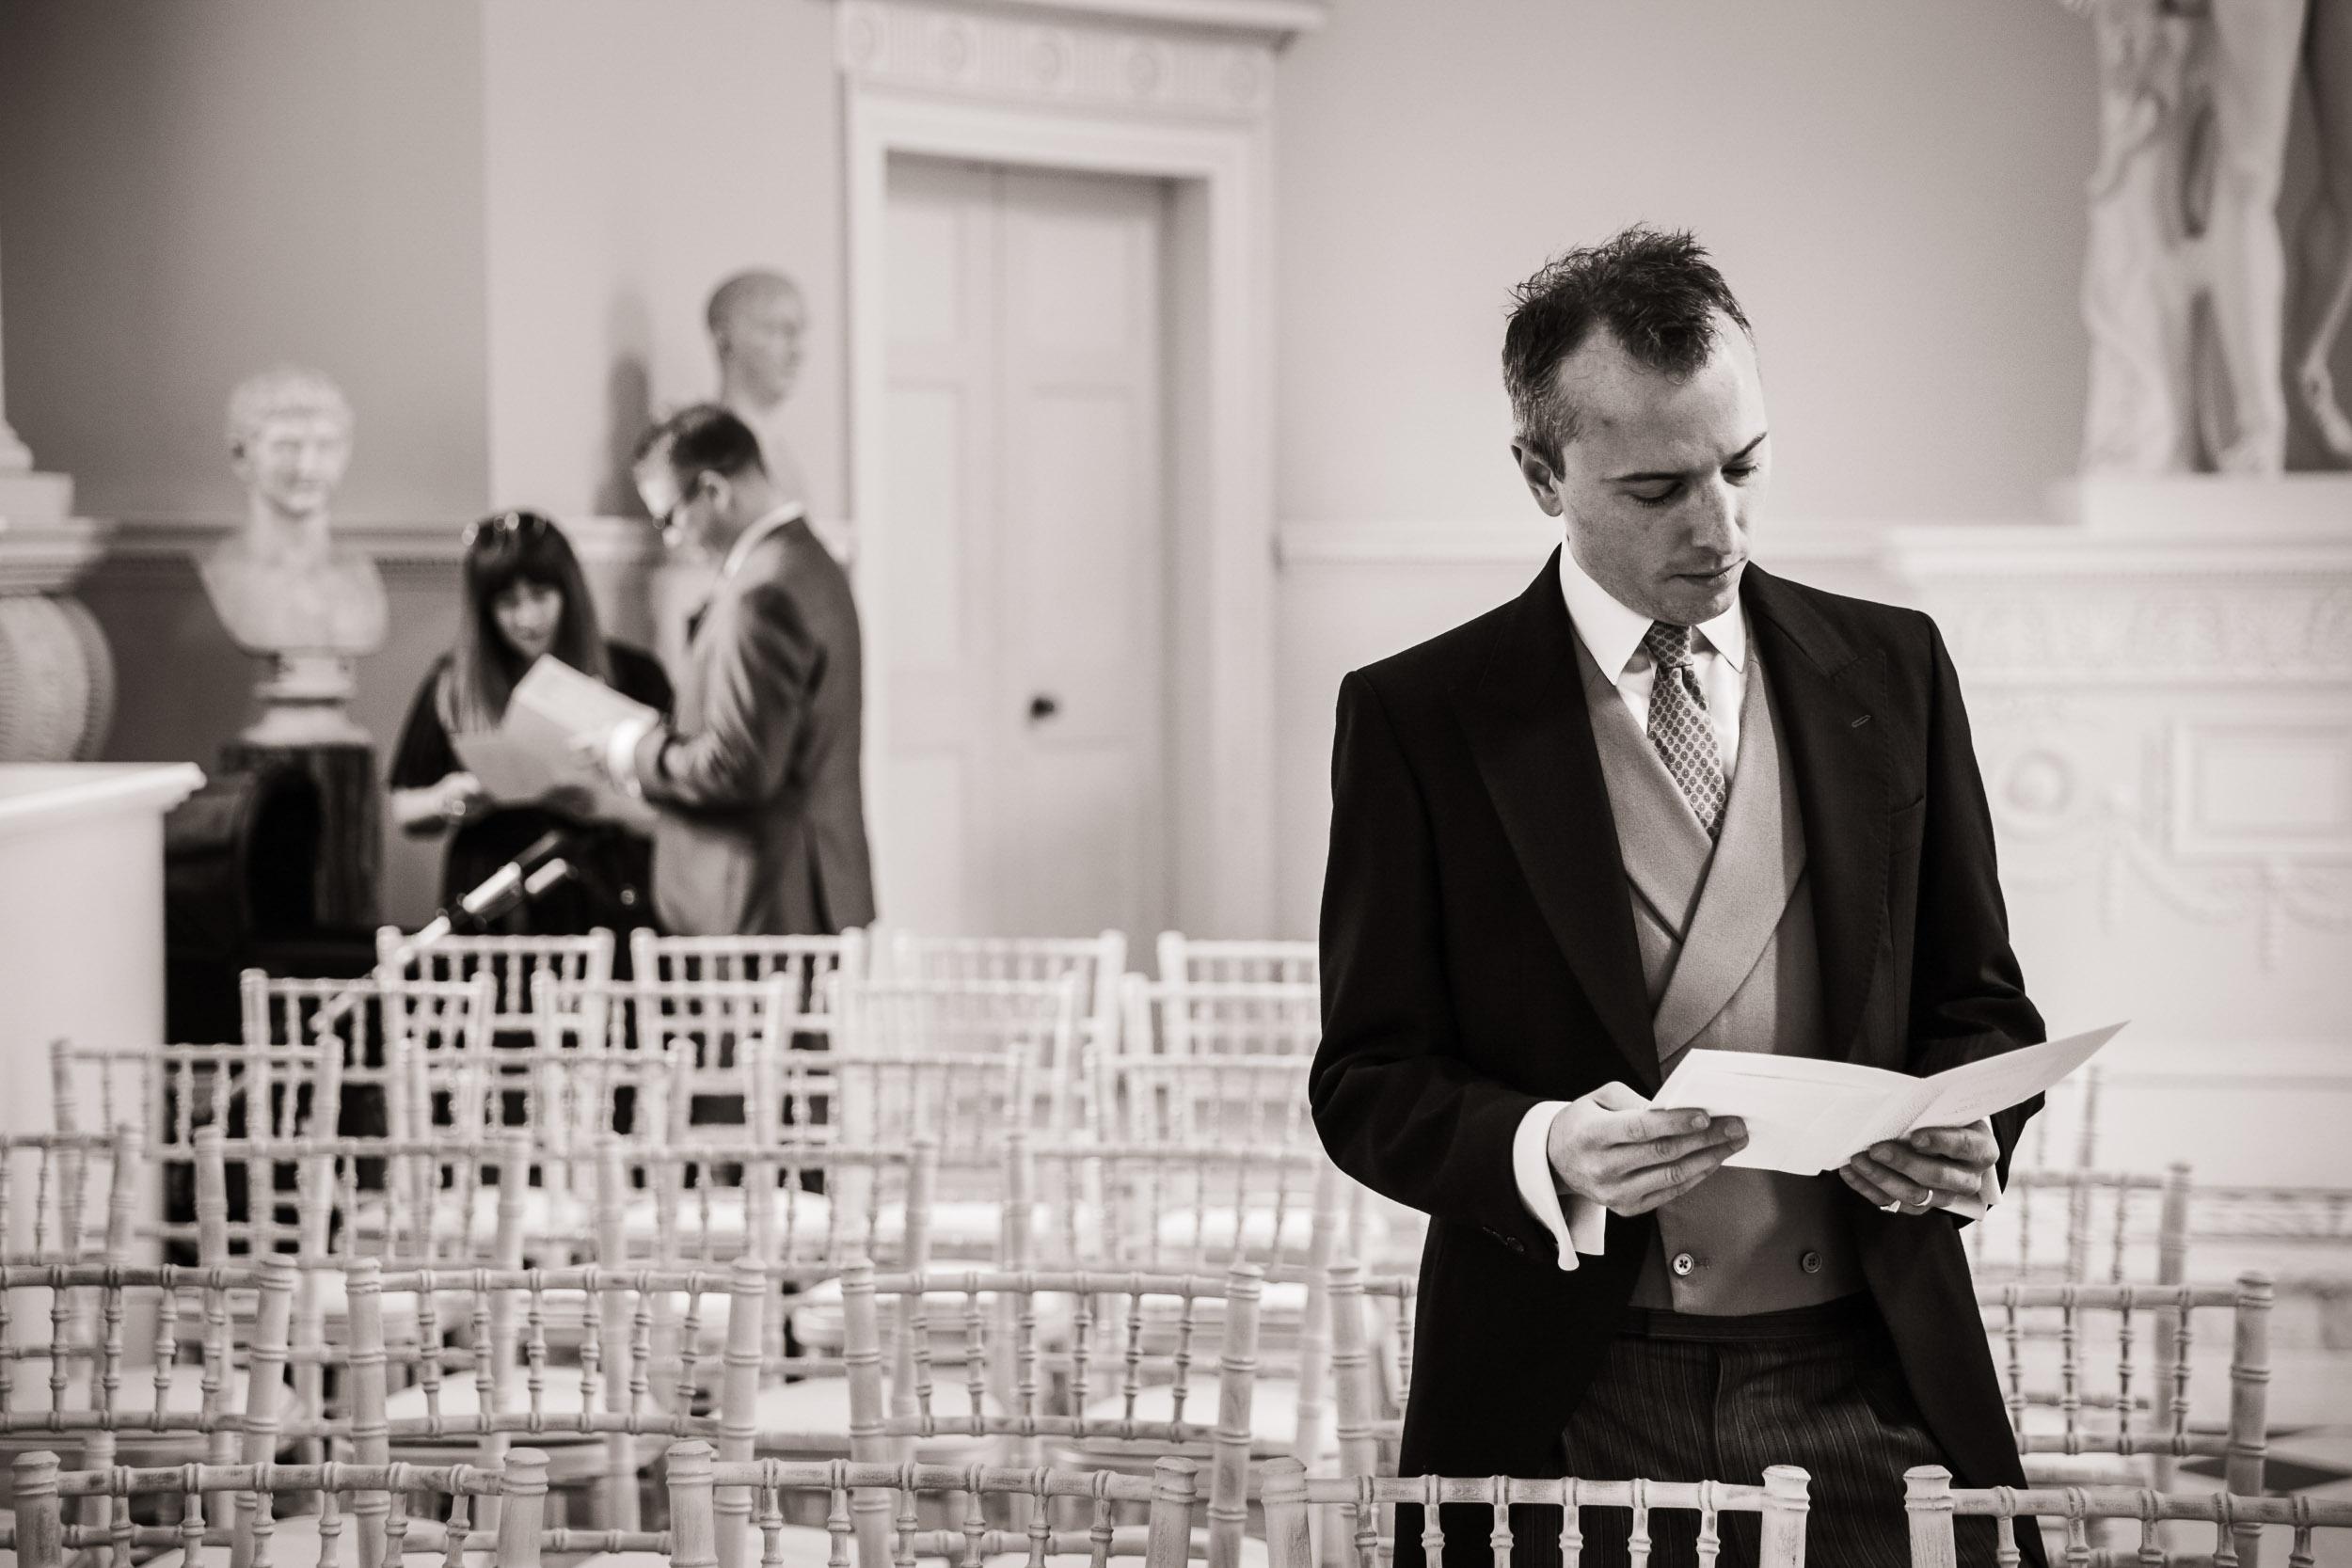 syon-house-wedding-photographer-london 028.jpg